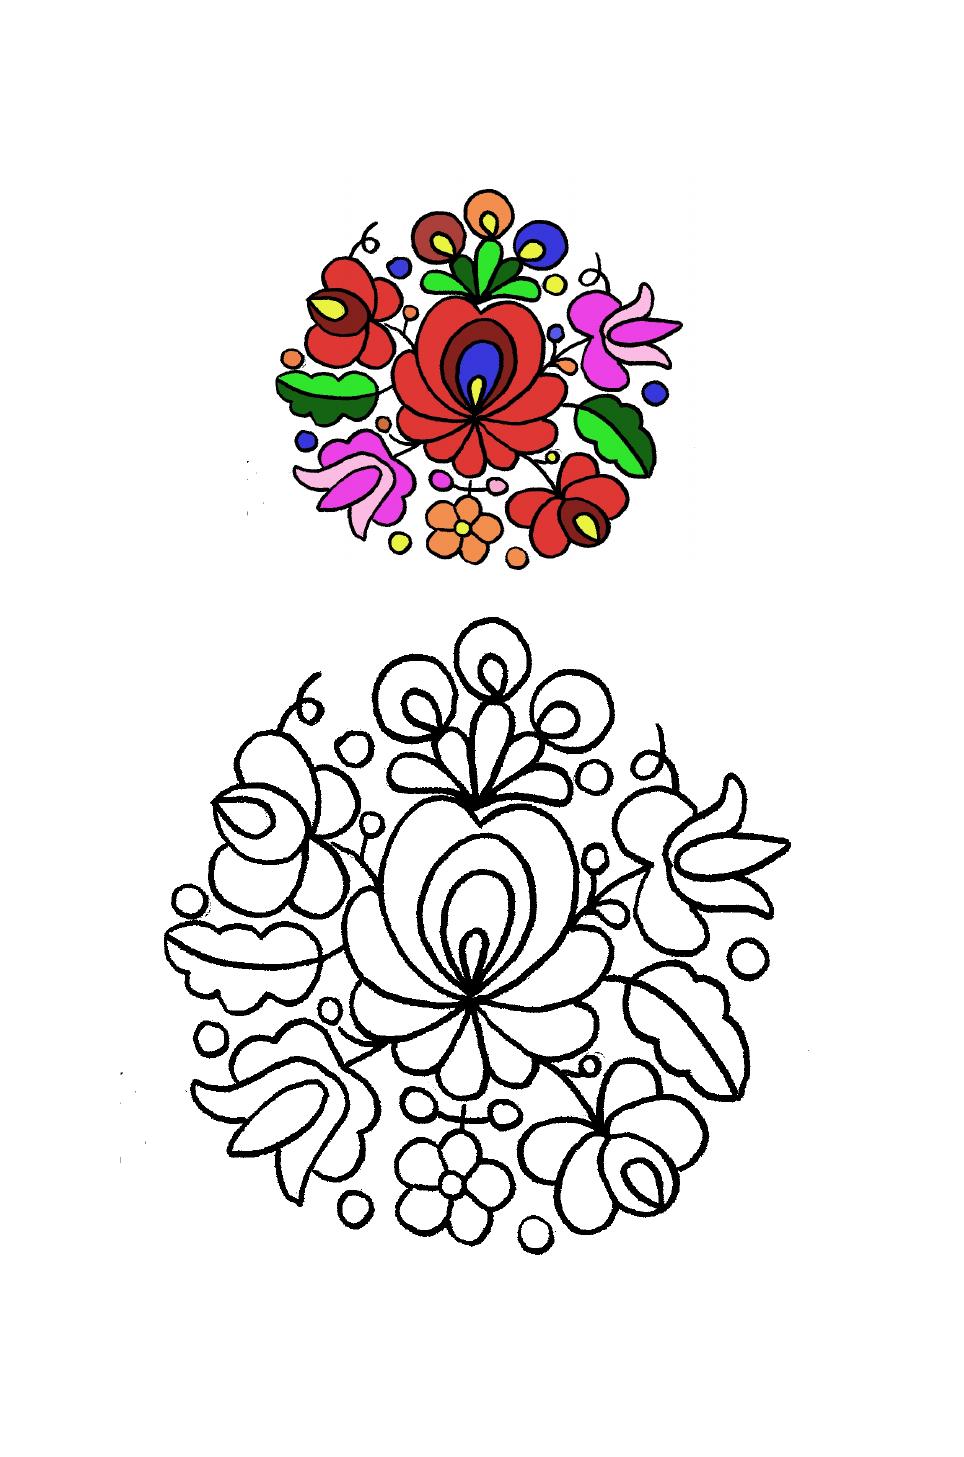 Pin by Laurie Wasson Terjak on R.P. Flowers | Pinterest | Bordado ...